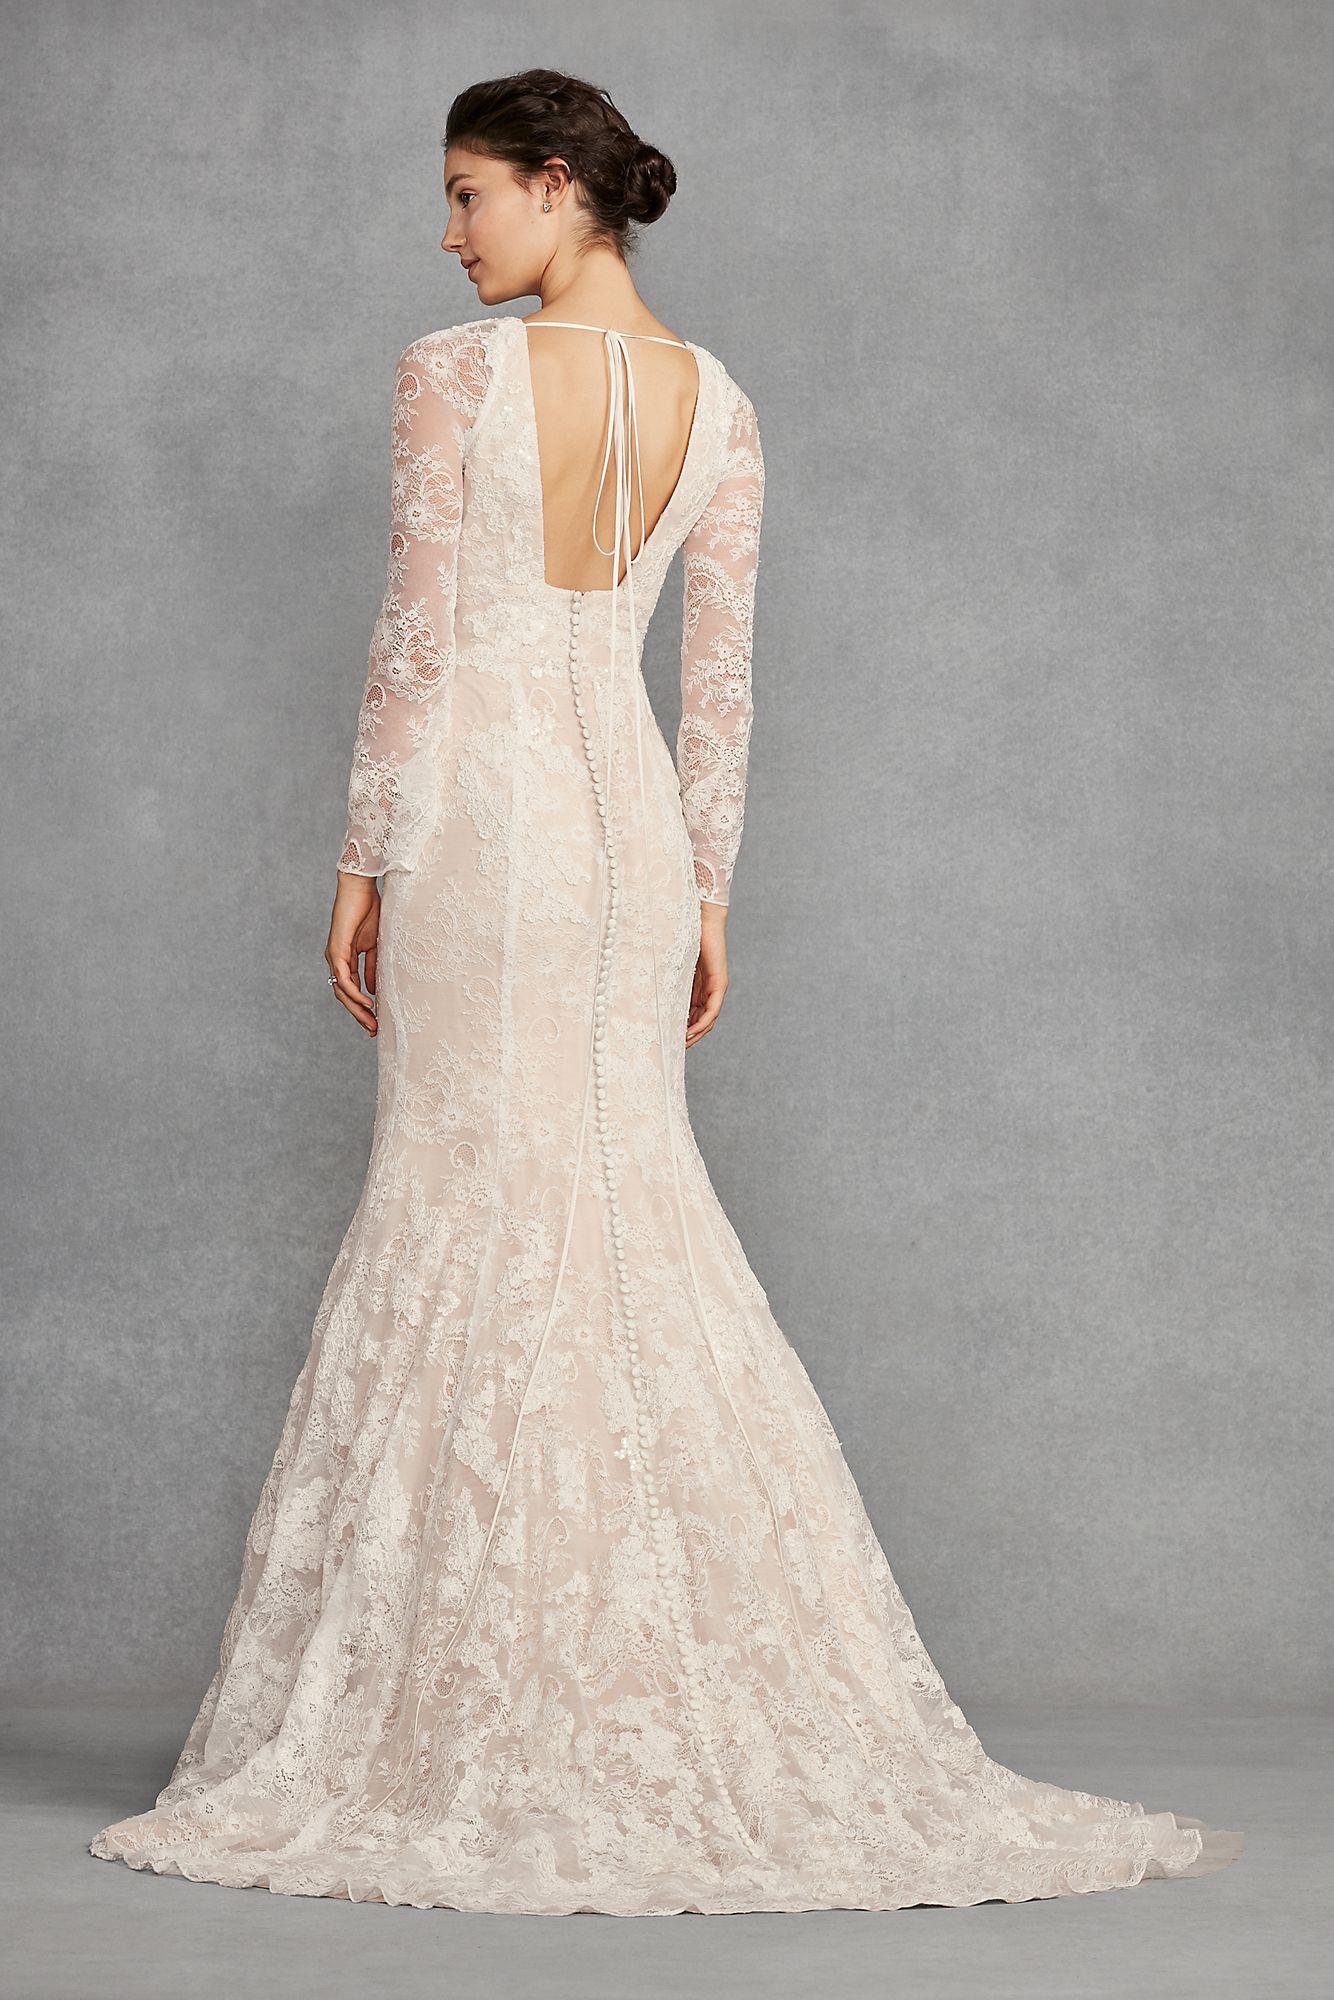 vera wang wedding dresses with sleeves photo - 1